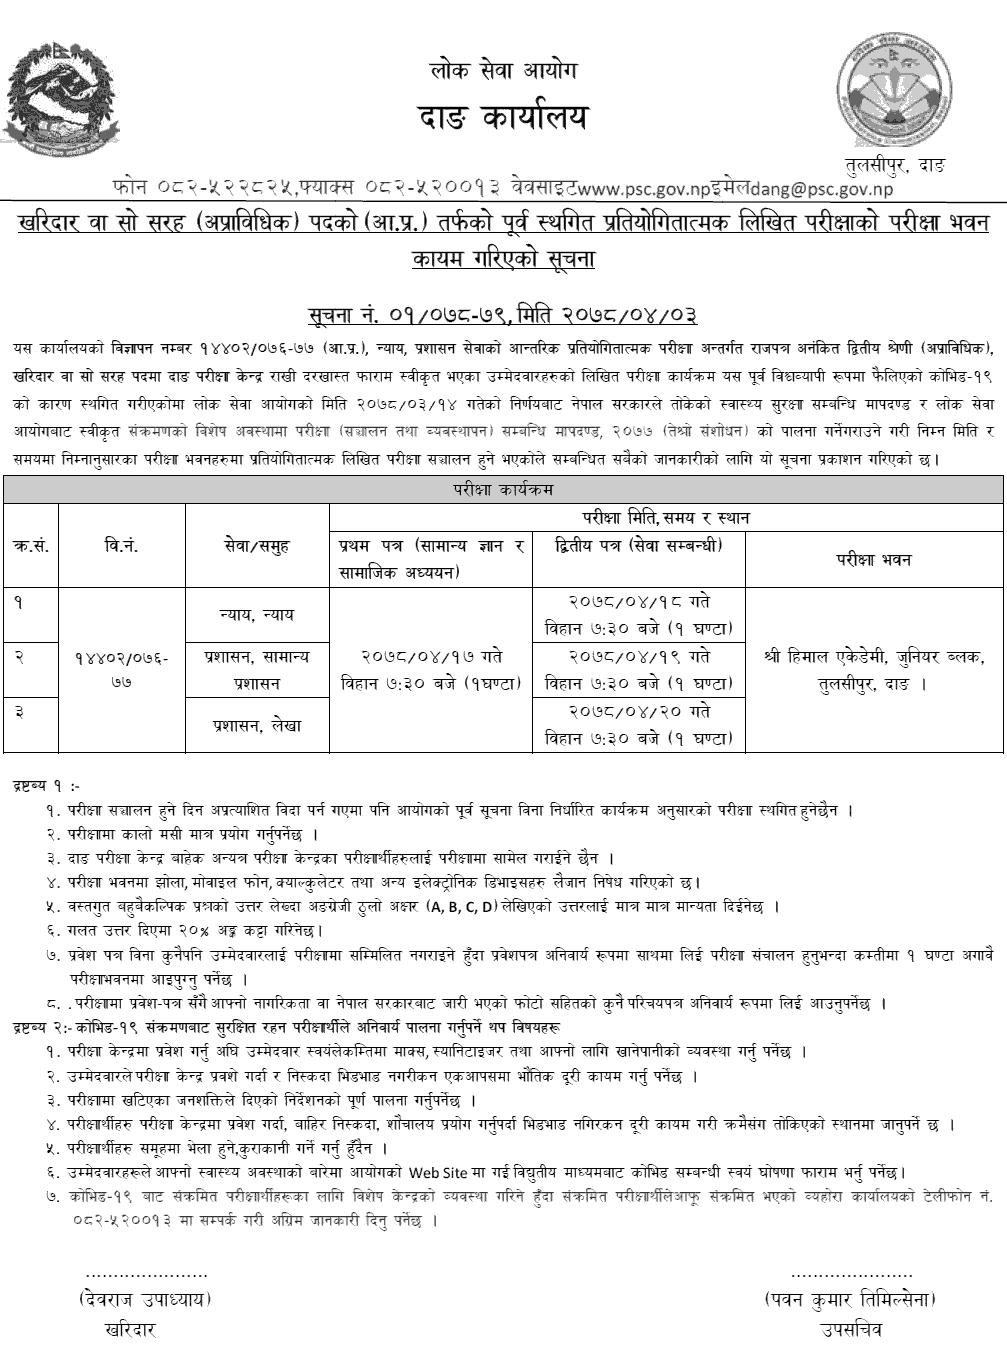 8) Lok Sewa Aayog Dang (Kharidar Second Phase Written Exam Center)